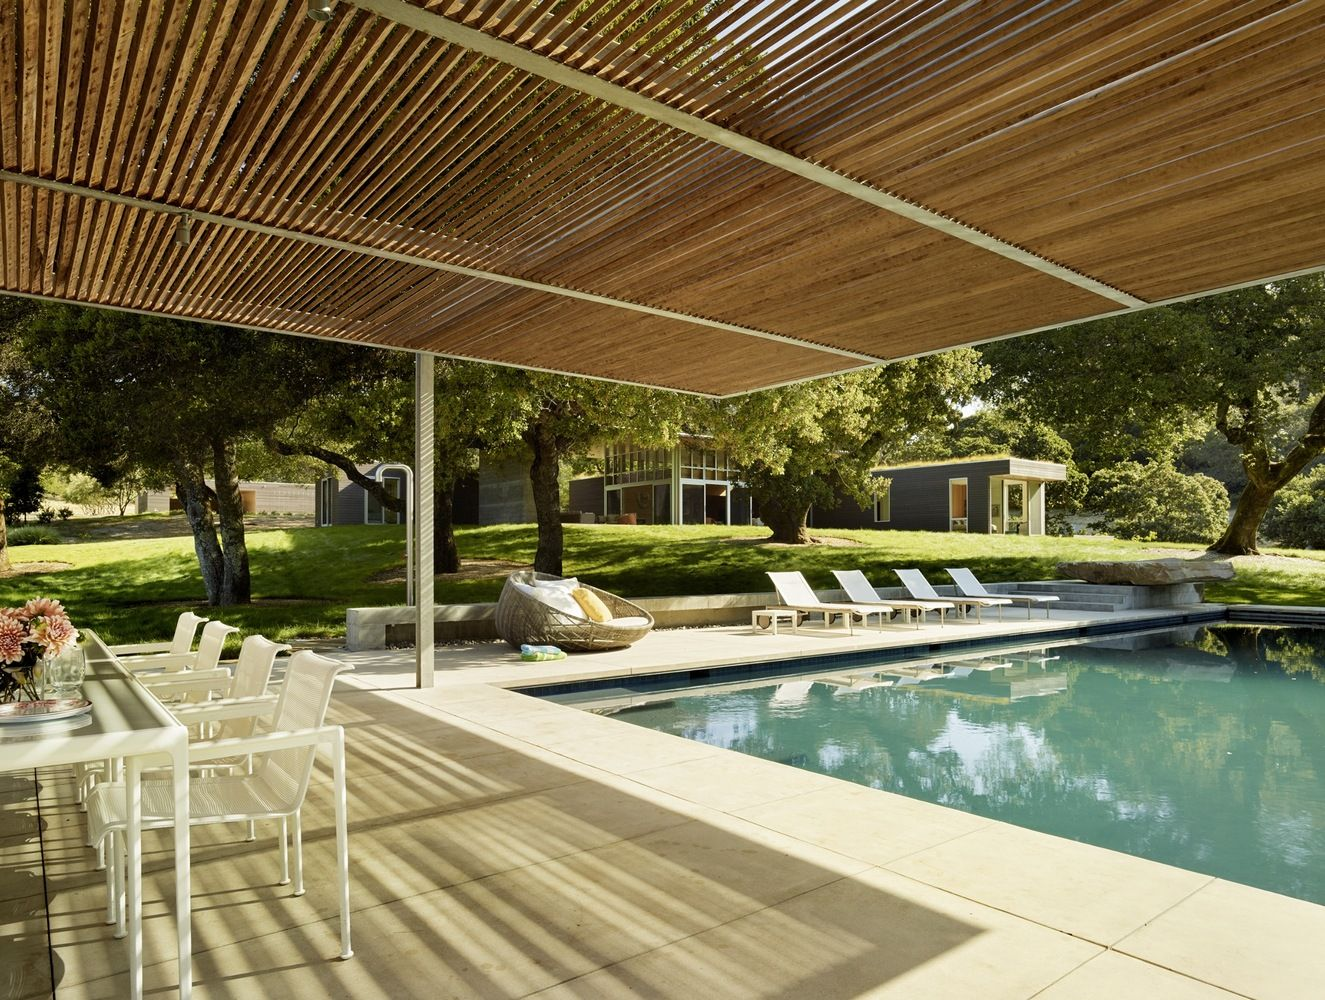 Galería de Residencia Sonoma / Turnbull Griffin Haesloop Architects - 3